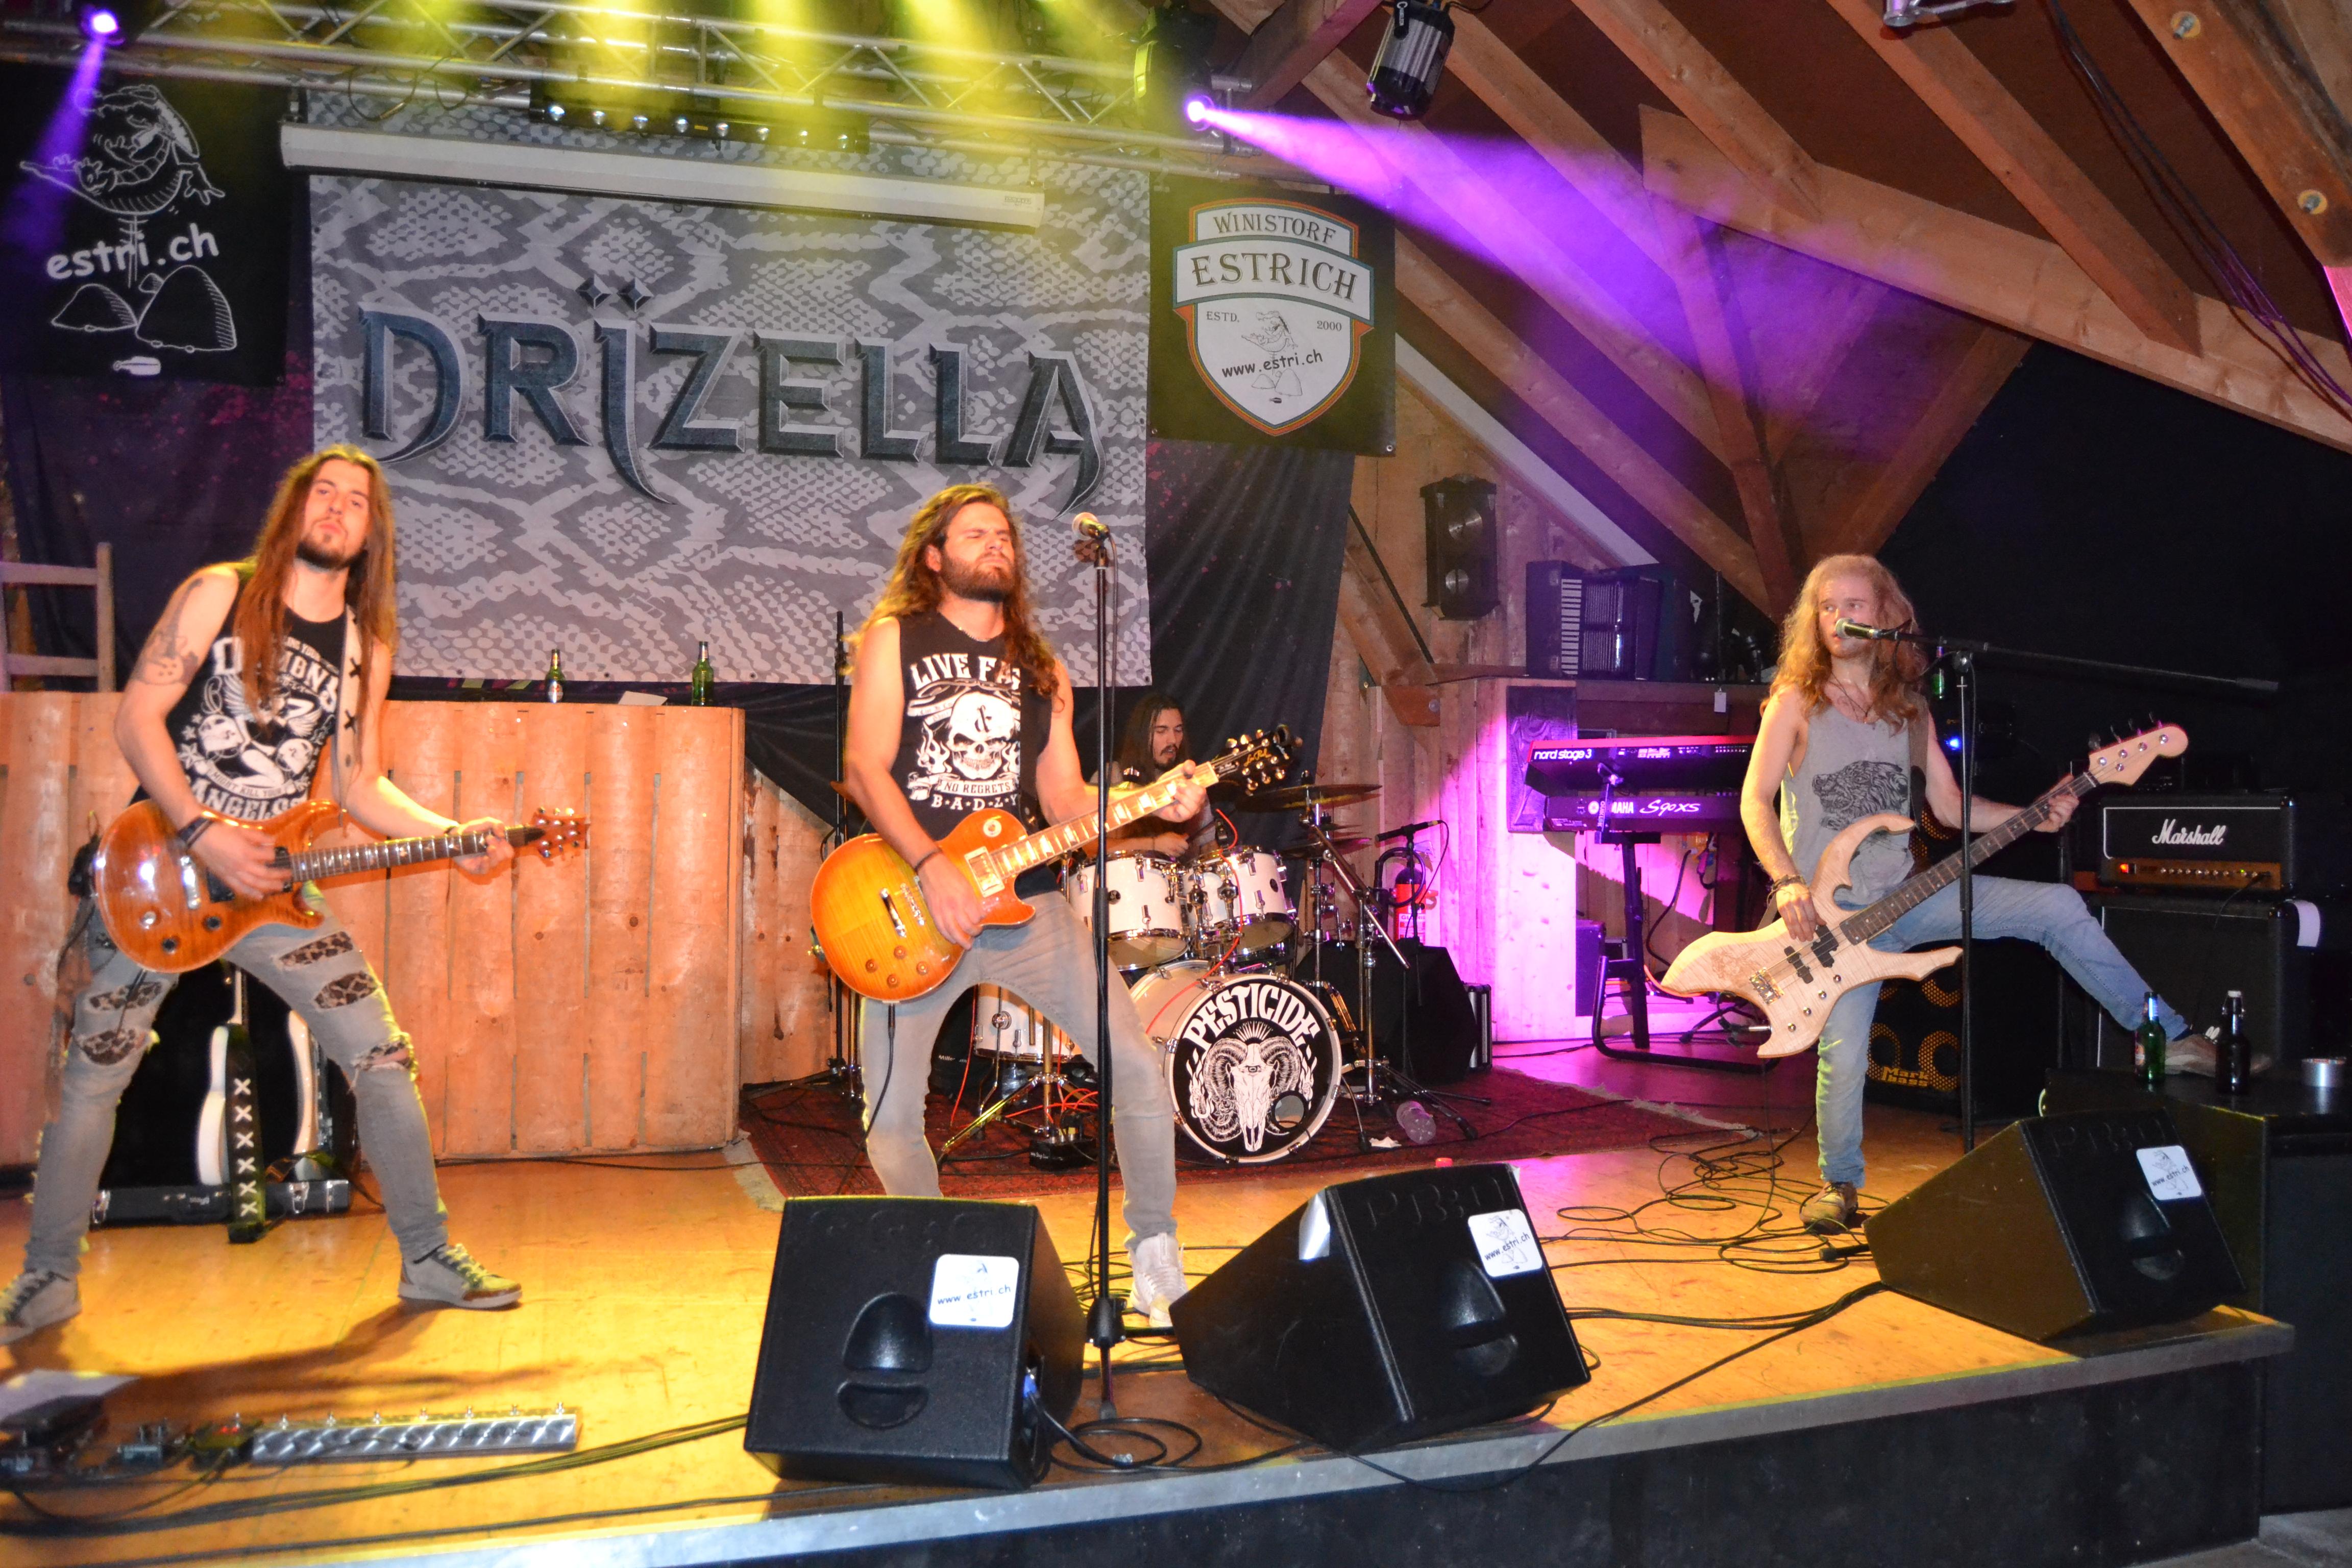 Estri.ch - Drïzella Band